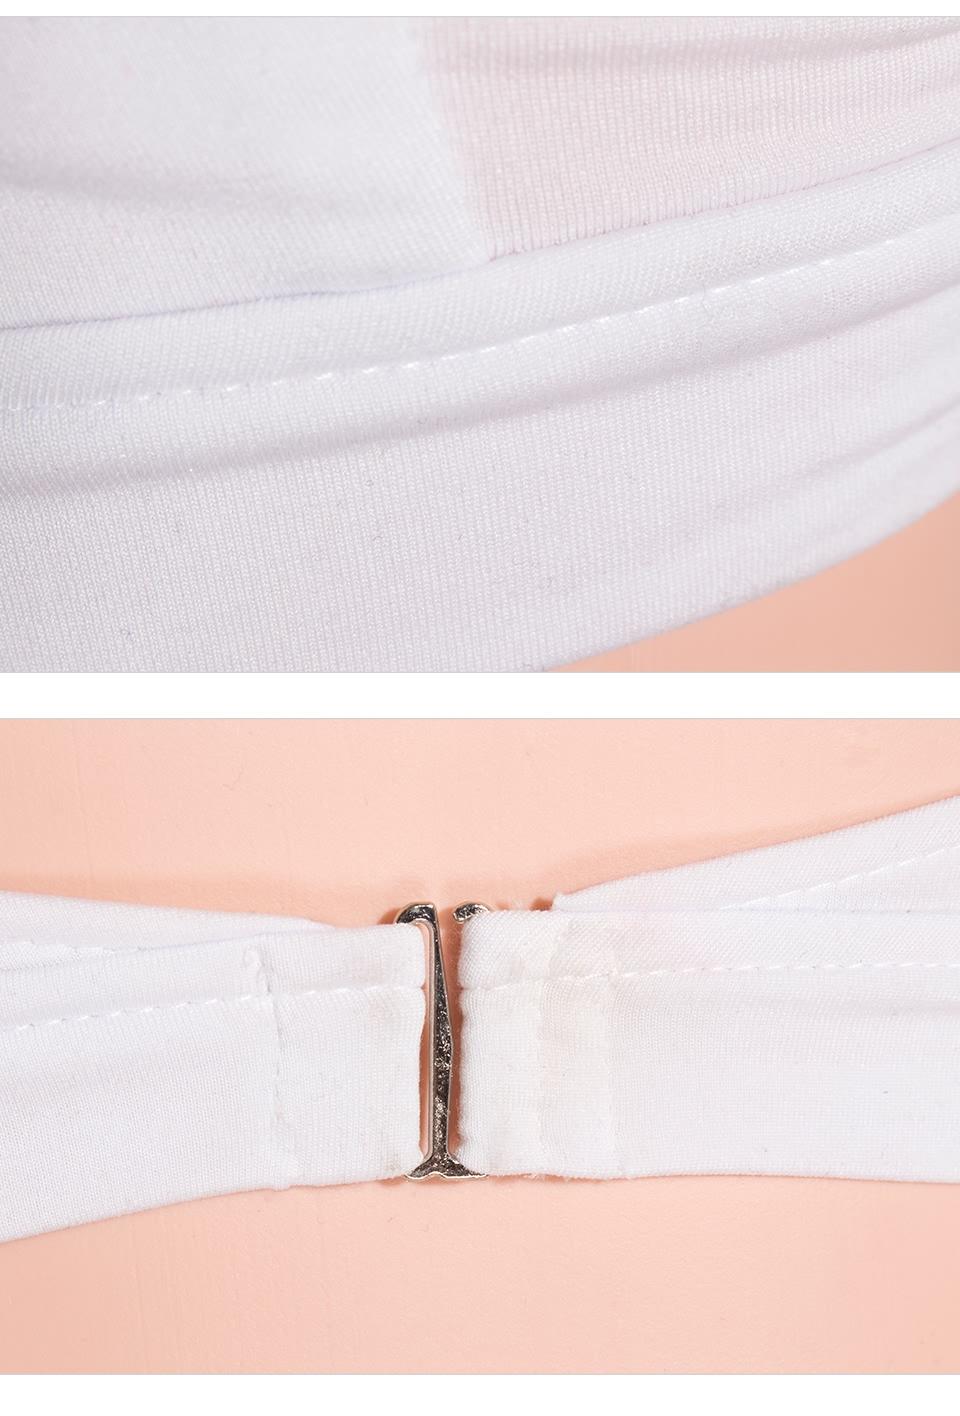 HTB18BmfRFXXXXaFXFXXq6xXFXXXH - FREE SHIPPING Summer Sexy Women Camis Crop Top Clubwear JKP319